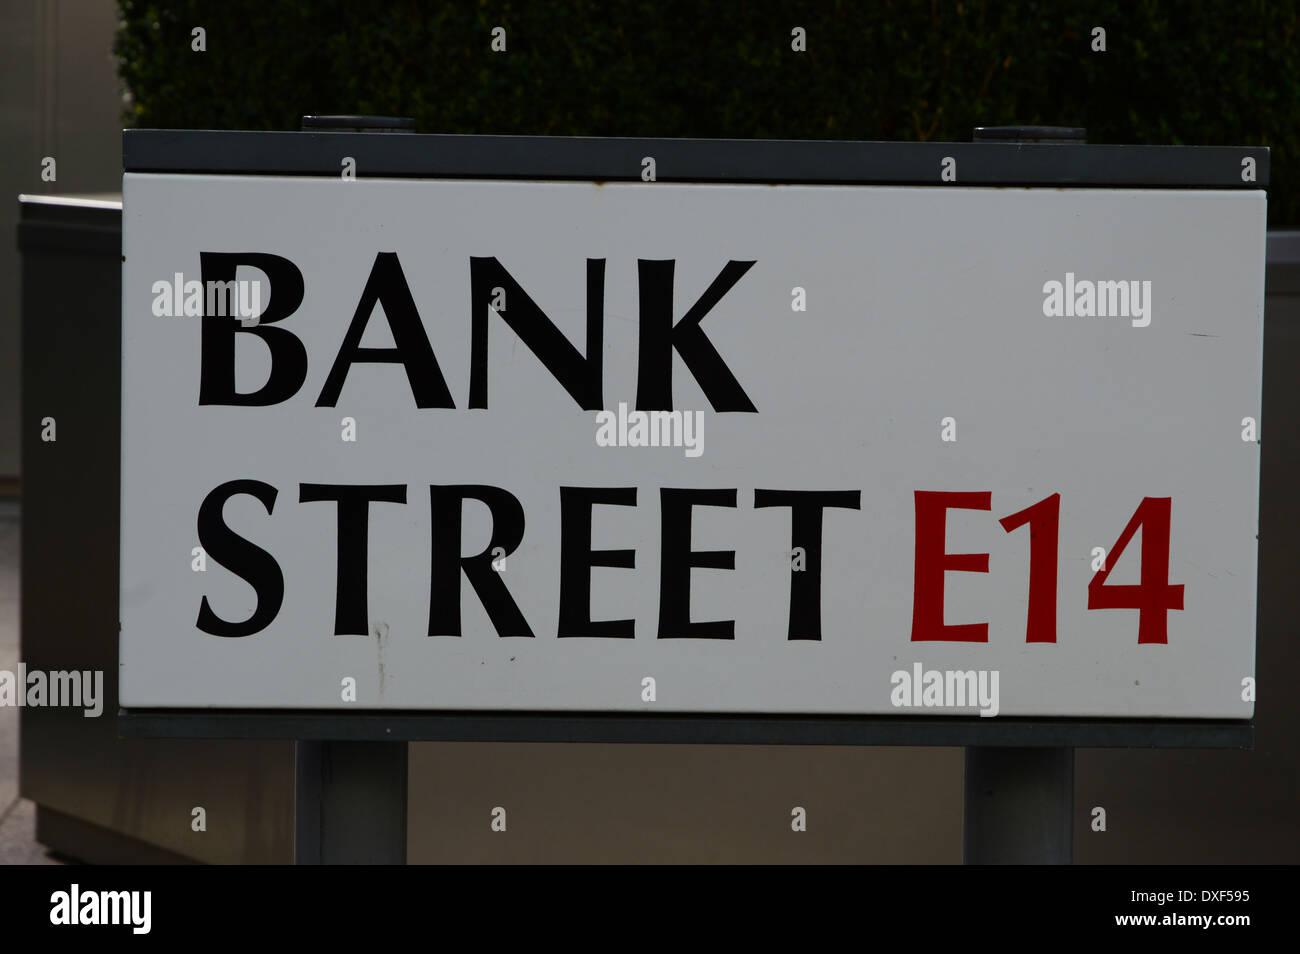 Bank Street - Stock Image